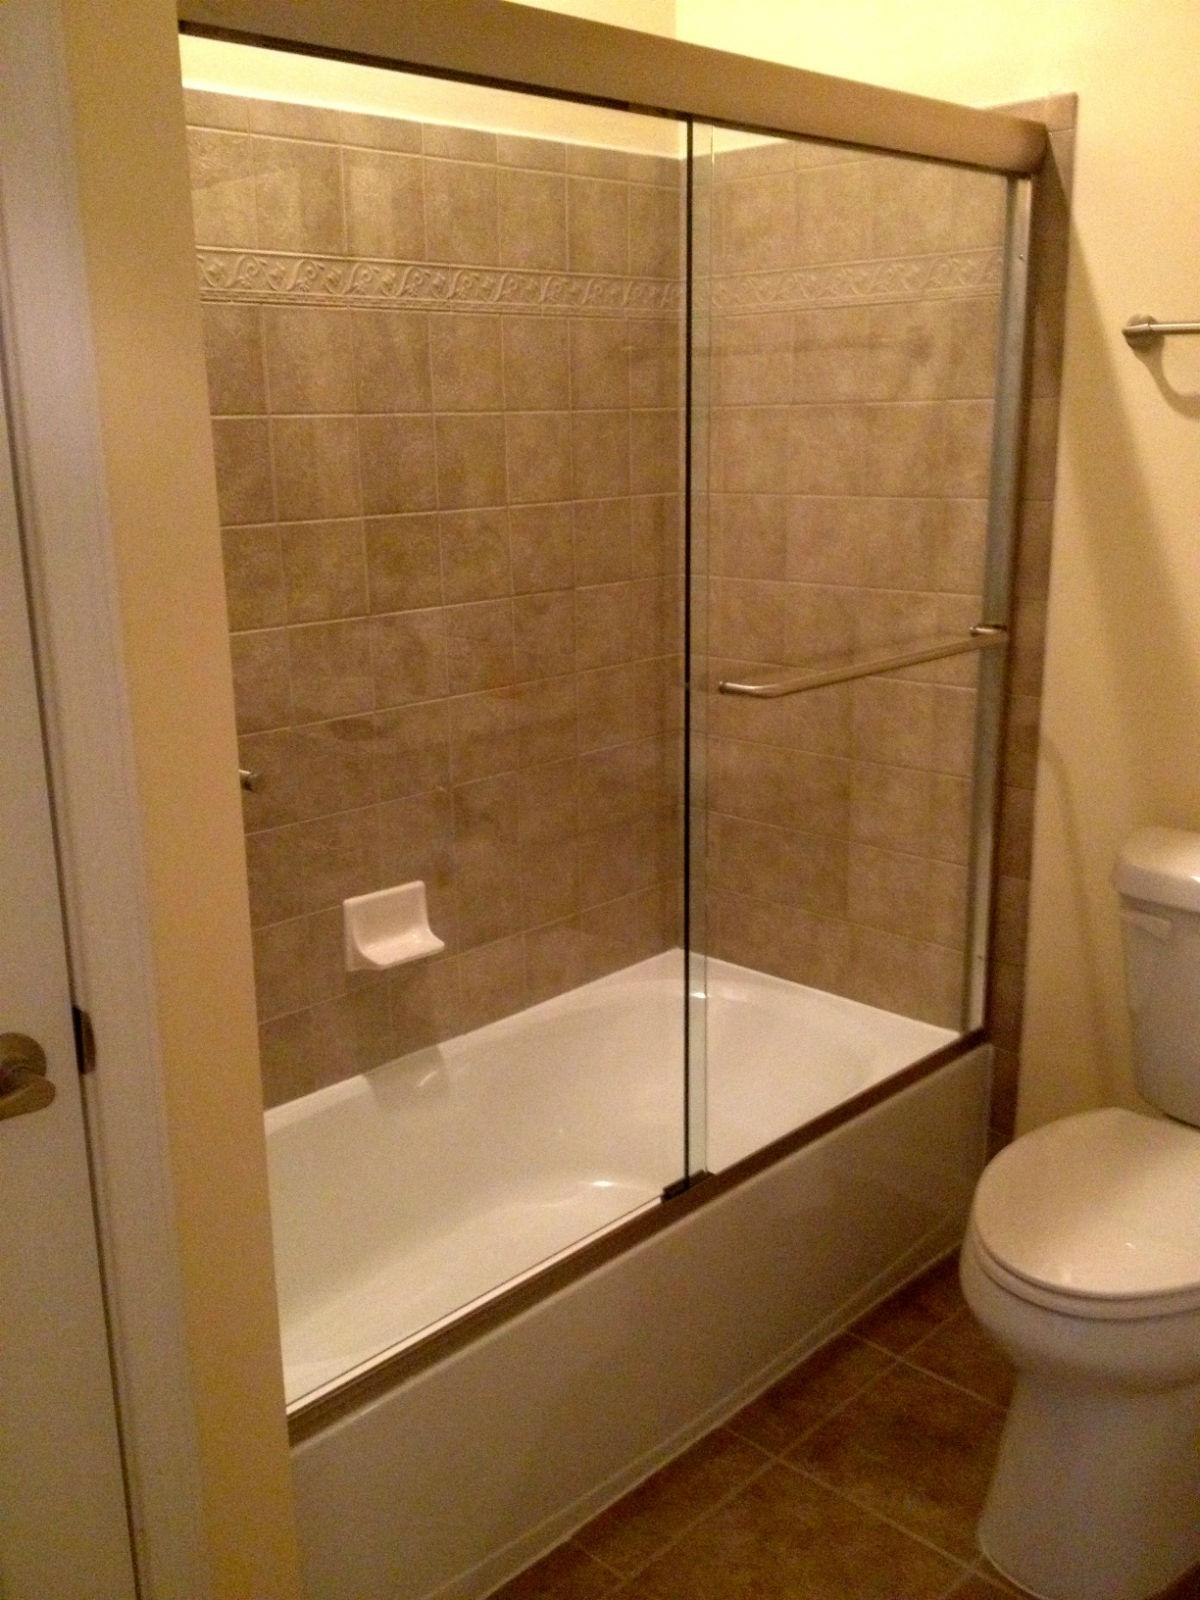 Midlothian Semi Frameless Sliding Glass Bathtub Enclosure